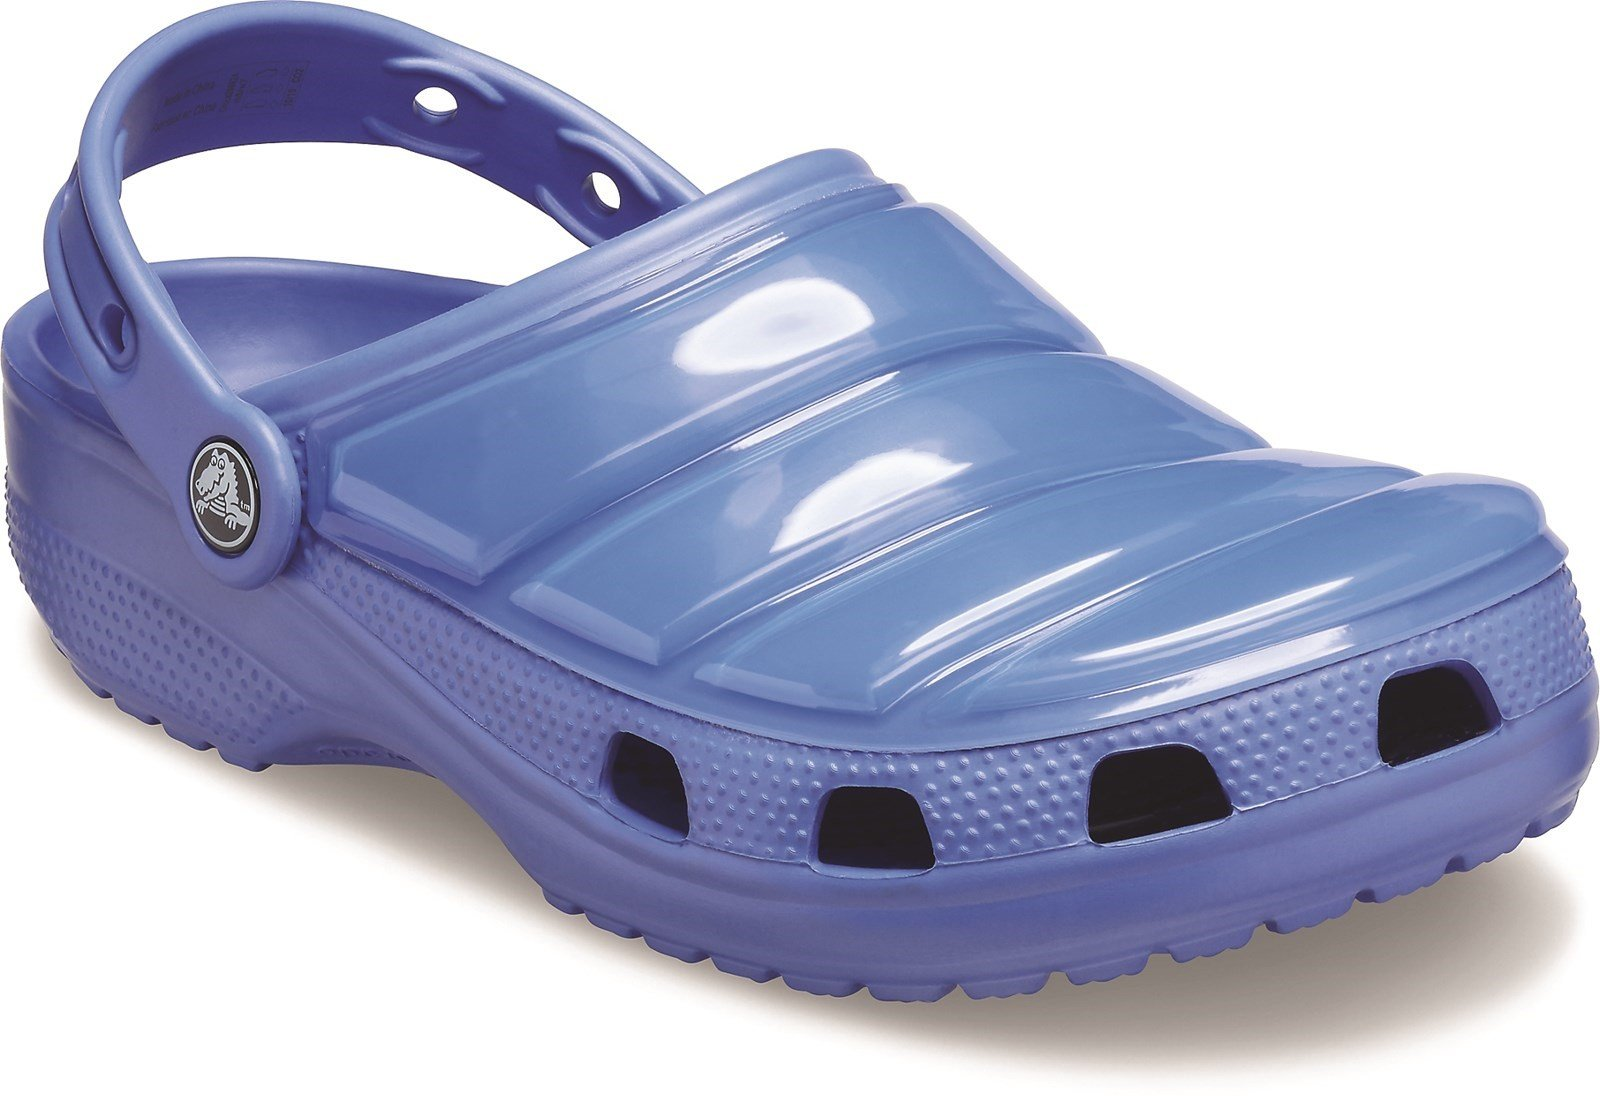 Crocs Unisex Classic Neo Puff Clog Sandal Light Blue 31448 - Light Blue 3